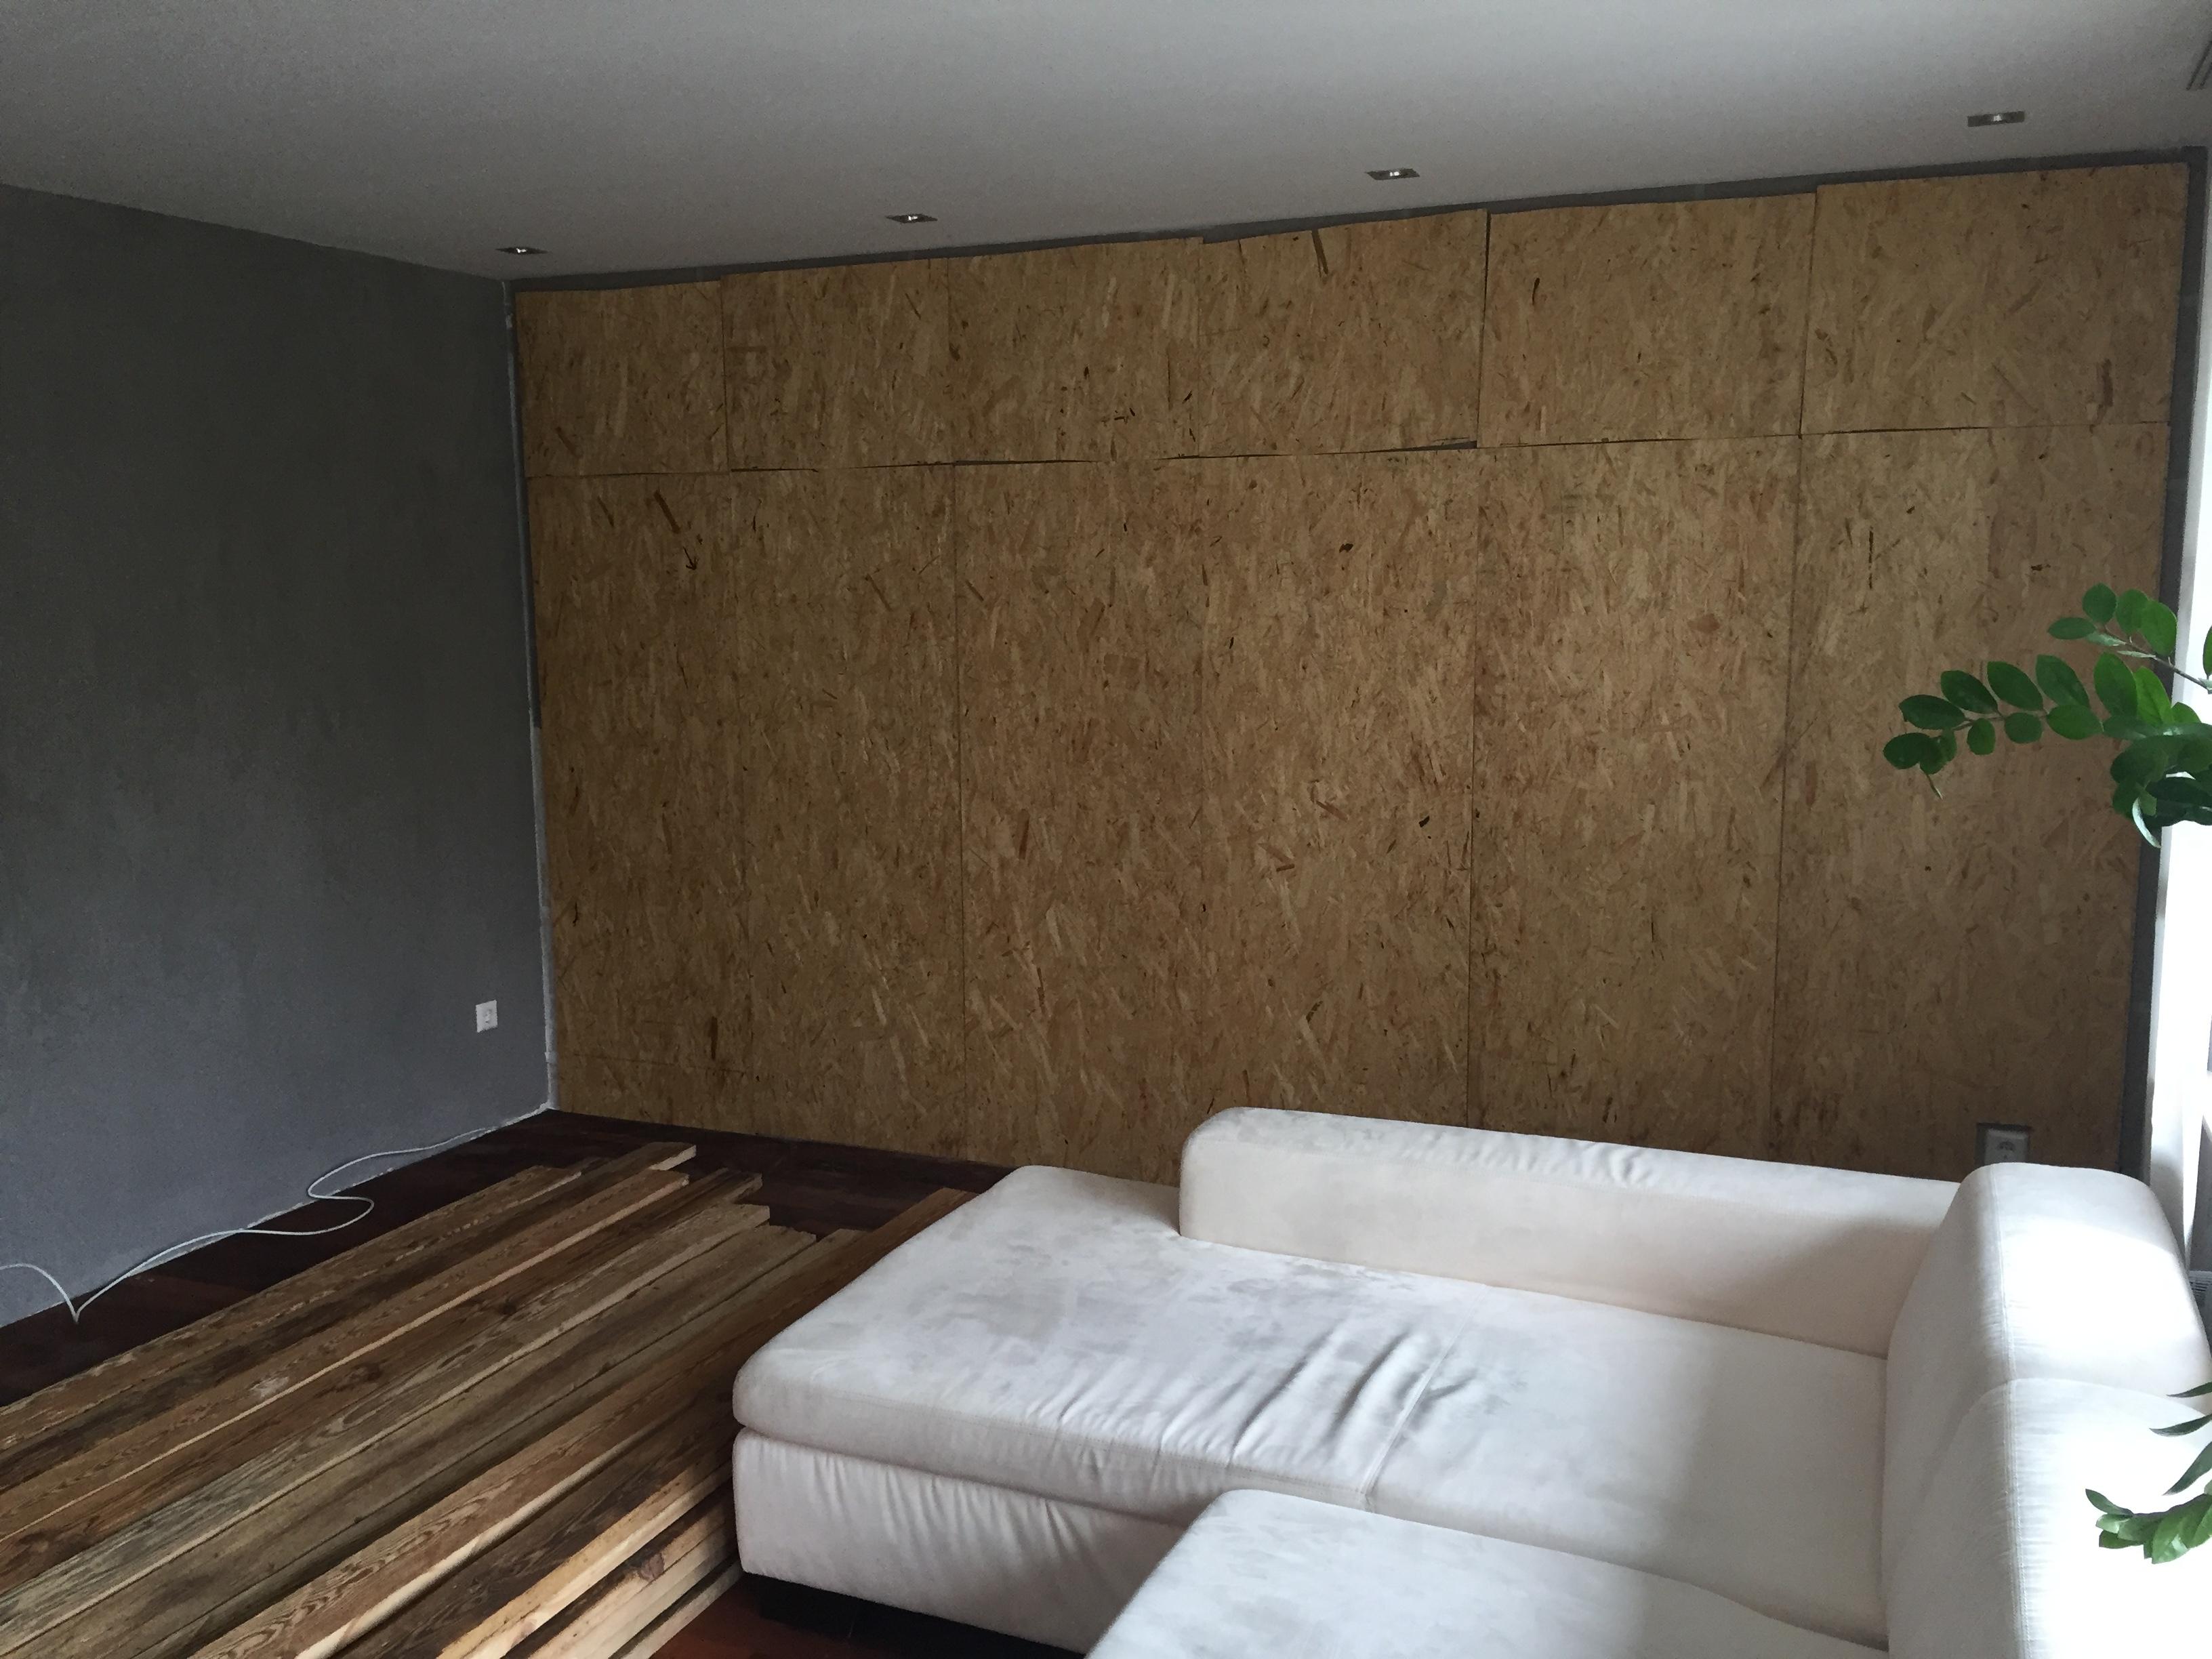 Bekannt Montage Holz Wandverkleidungen | BS-Holzdesign PN58